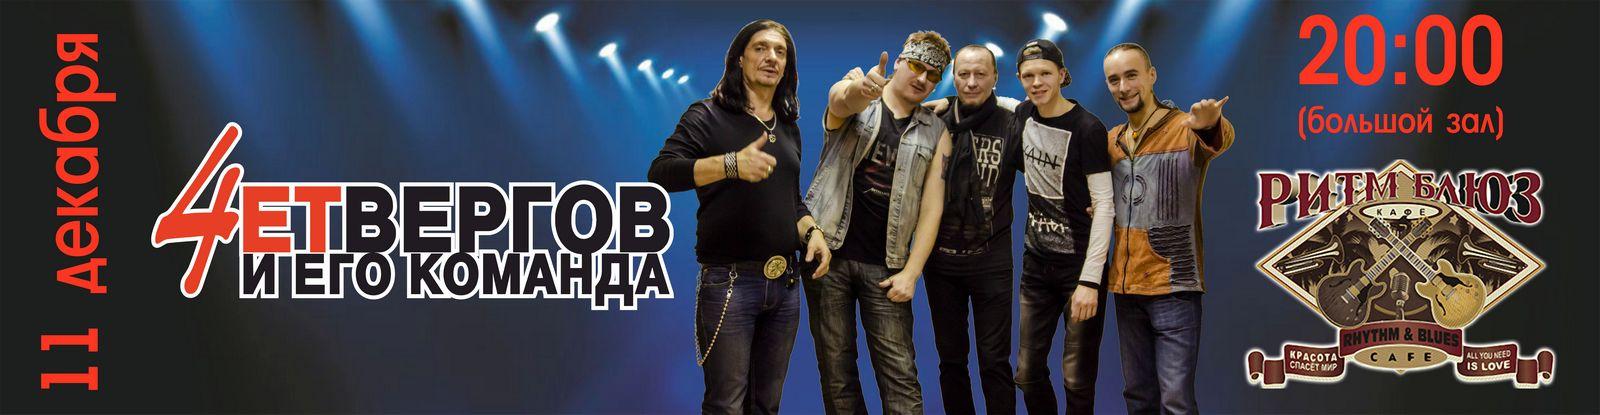 гитарист Дмитрий Четвергов